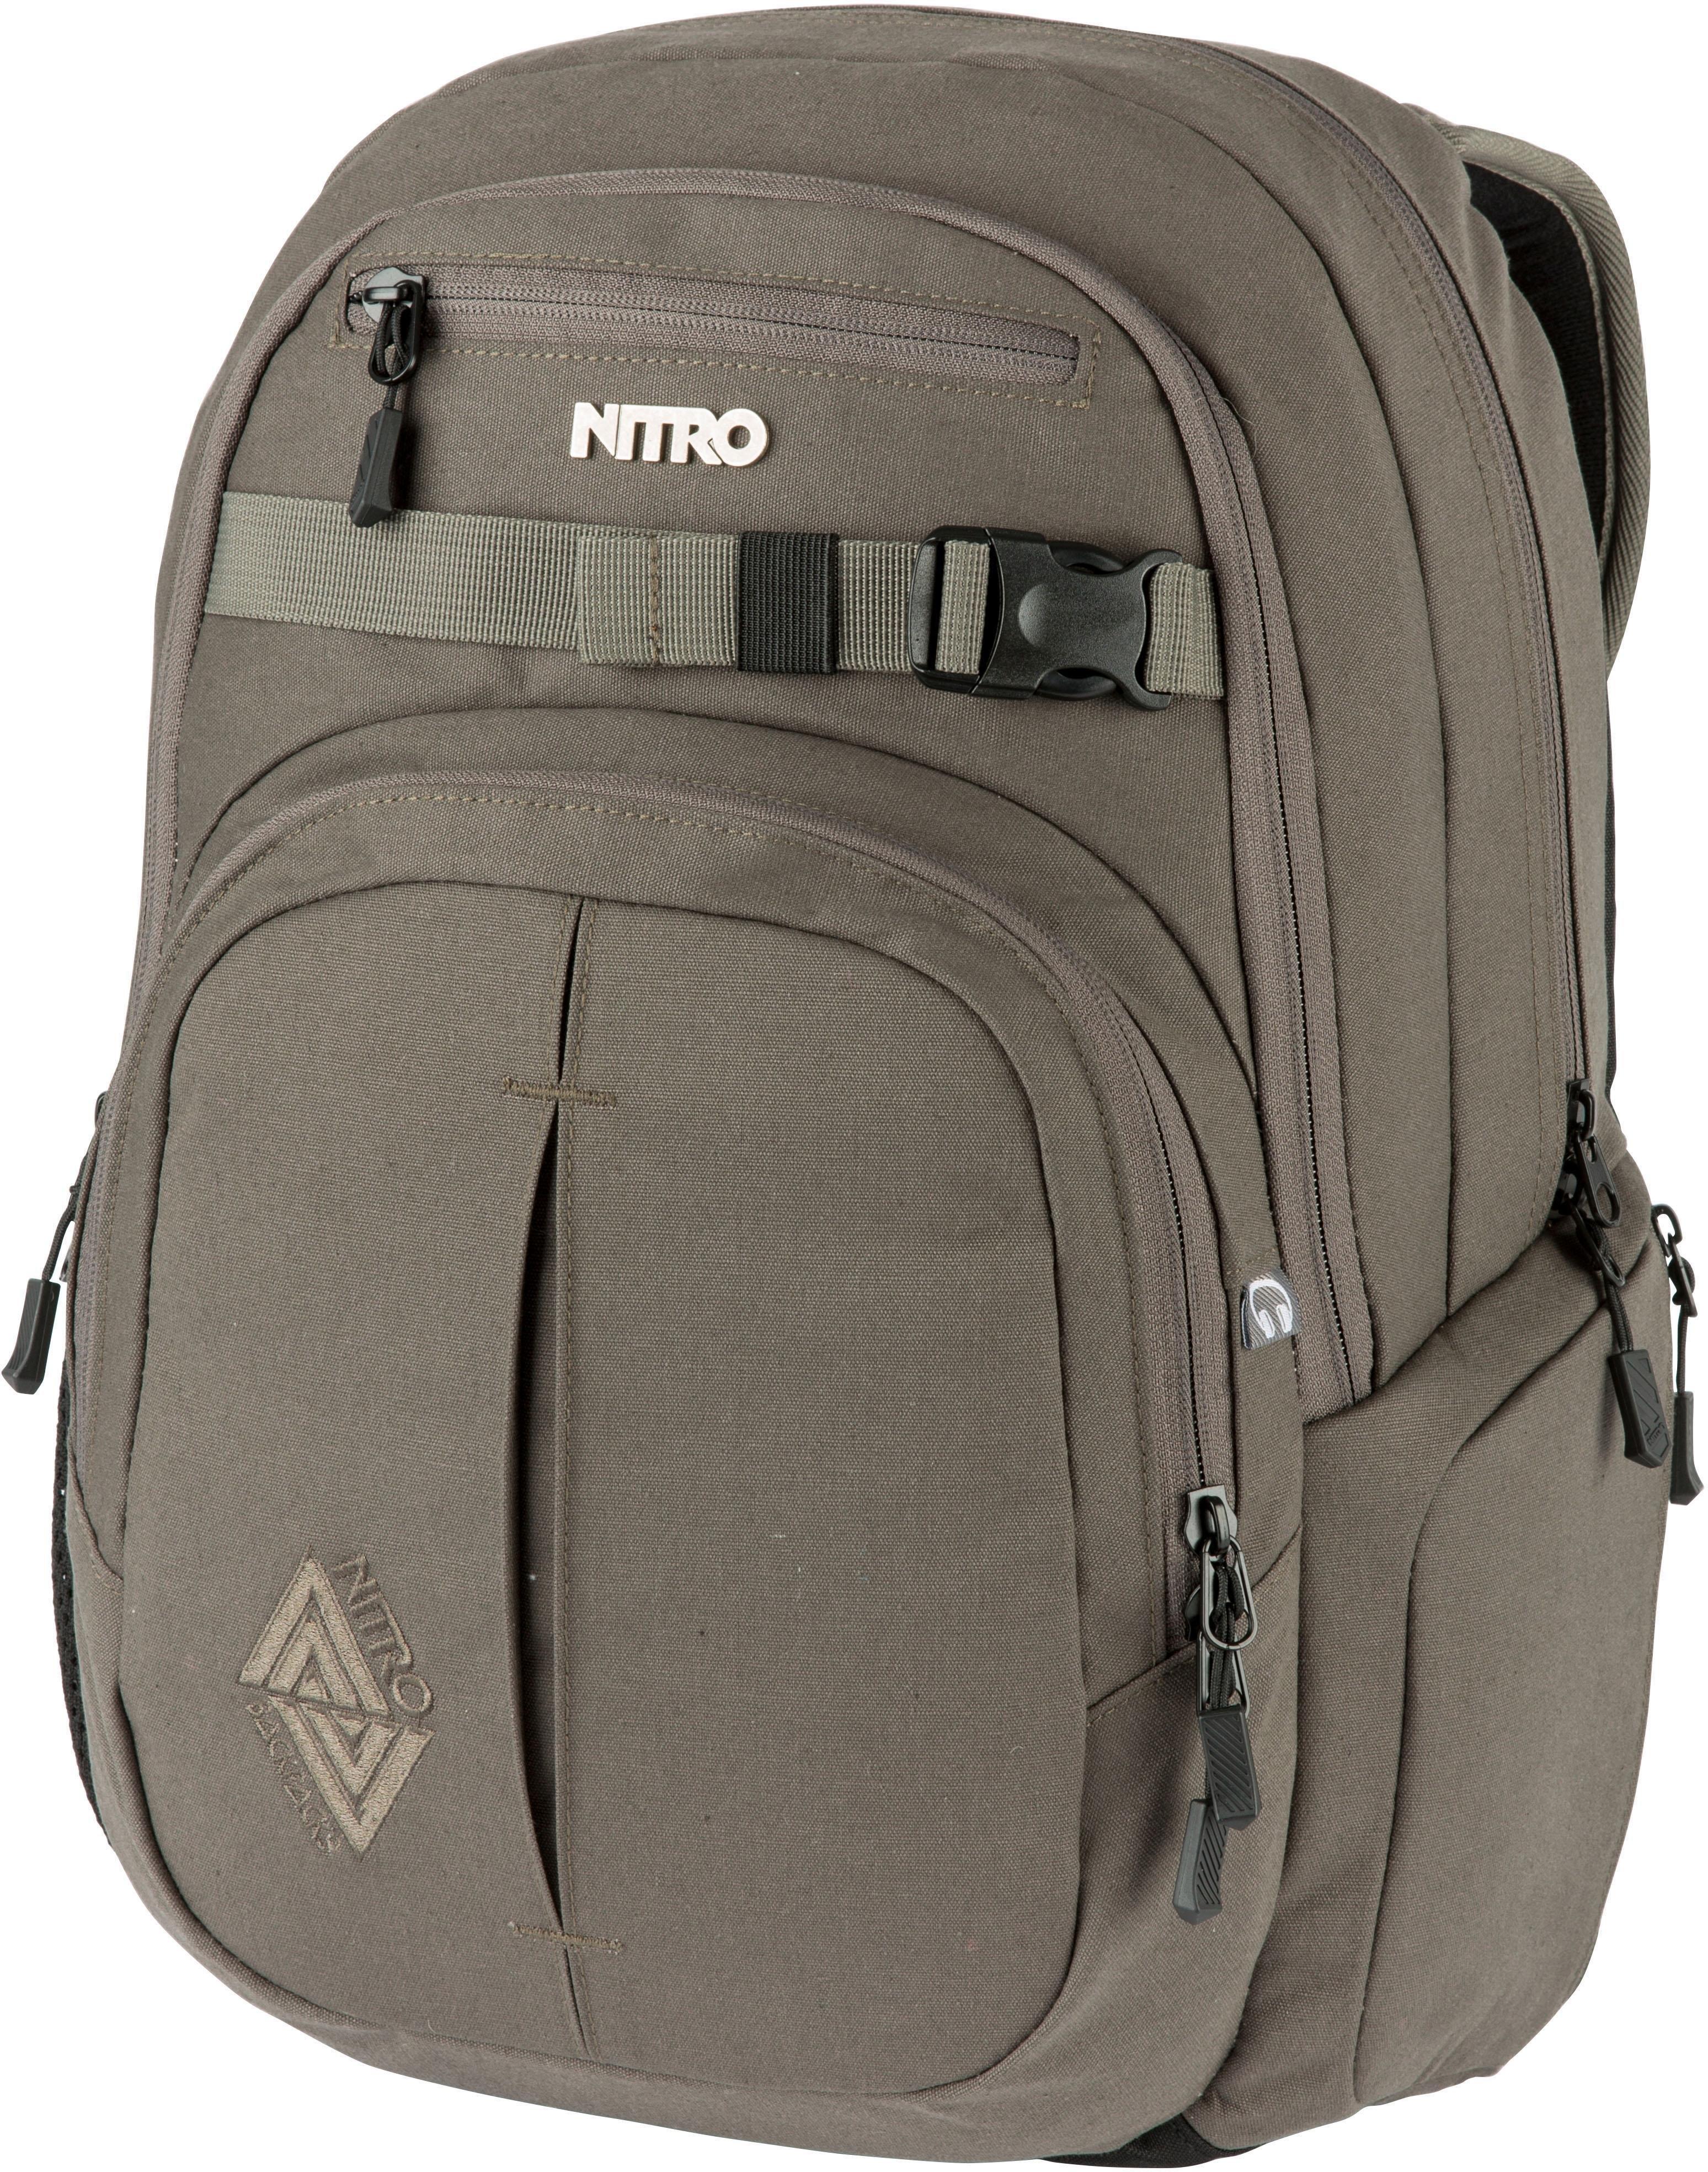 NITRO schoolrugzak met laptopvak, »Chase Waxed Lizard« bij OTTO online kopen